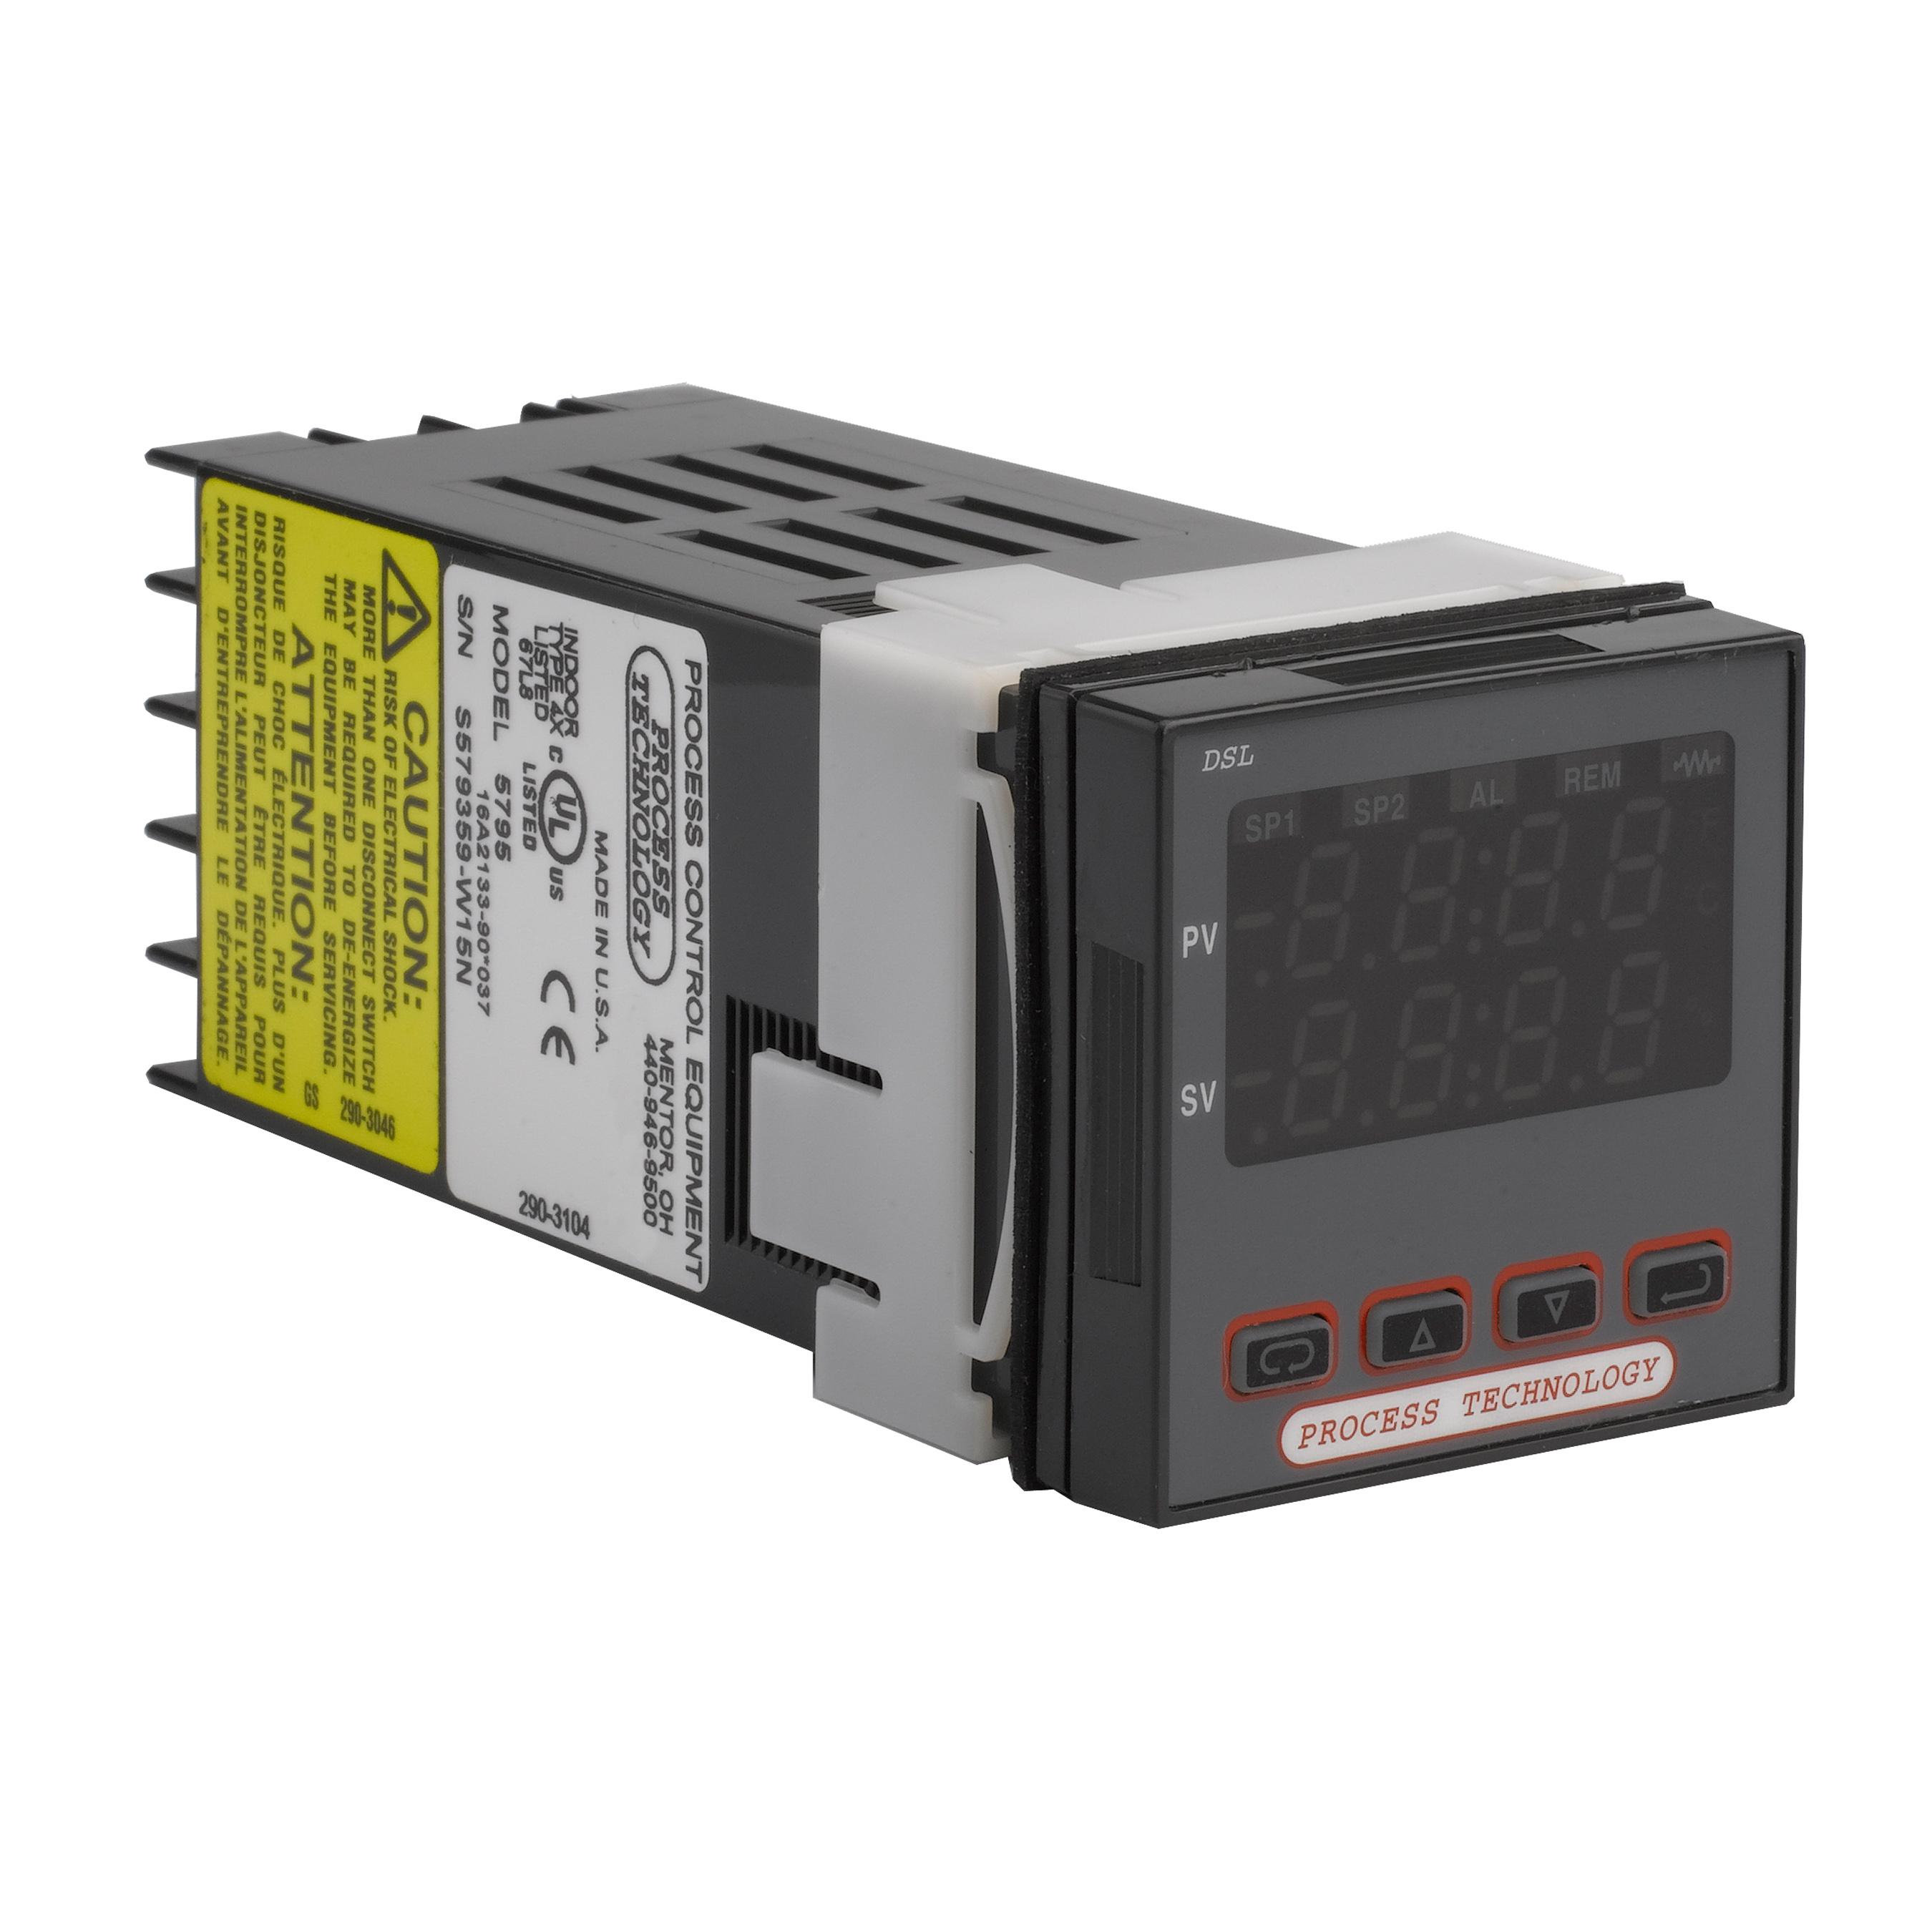 DSL Series Thermostat